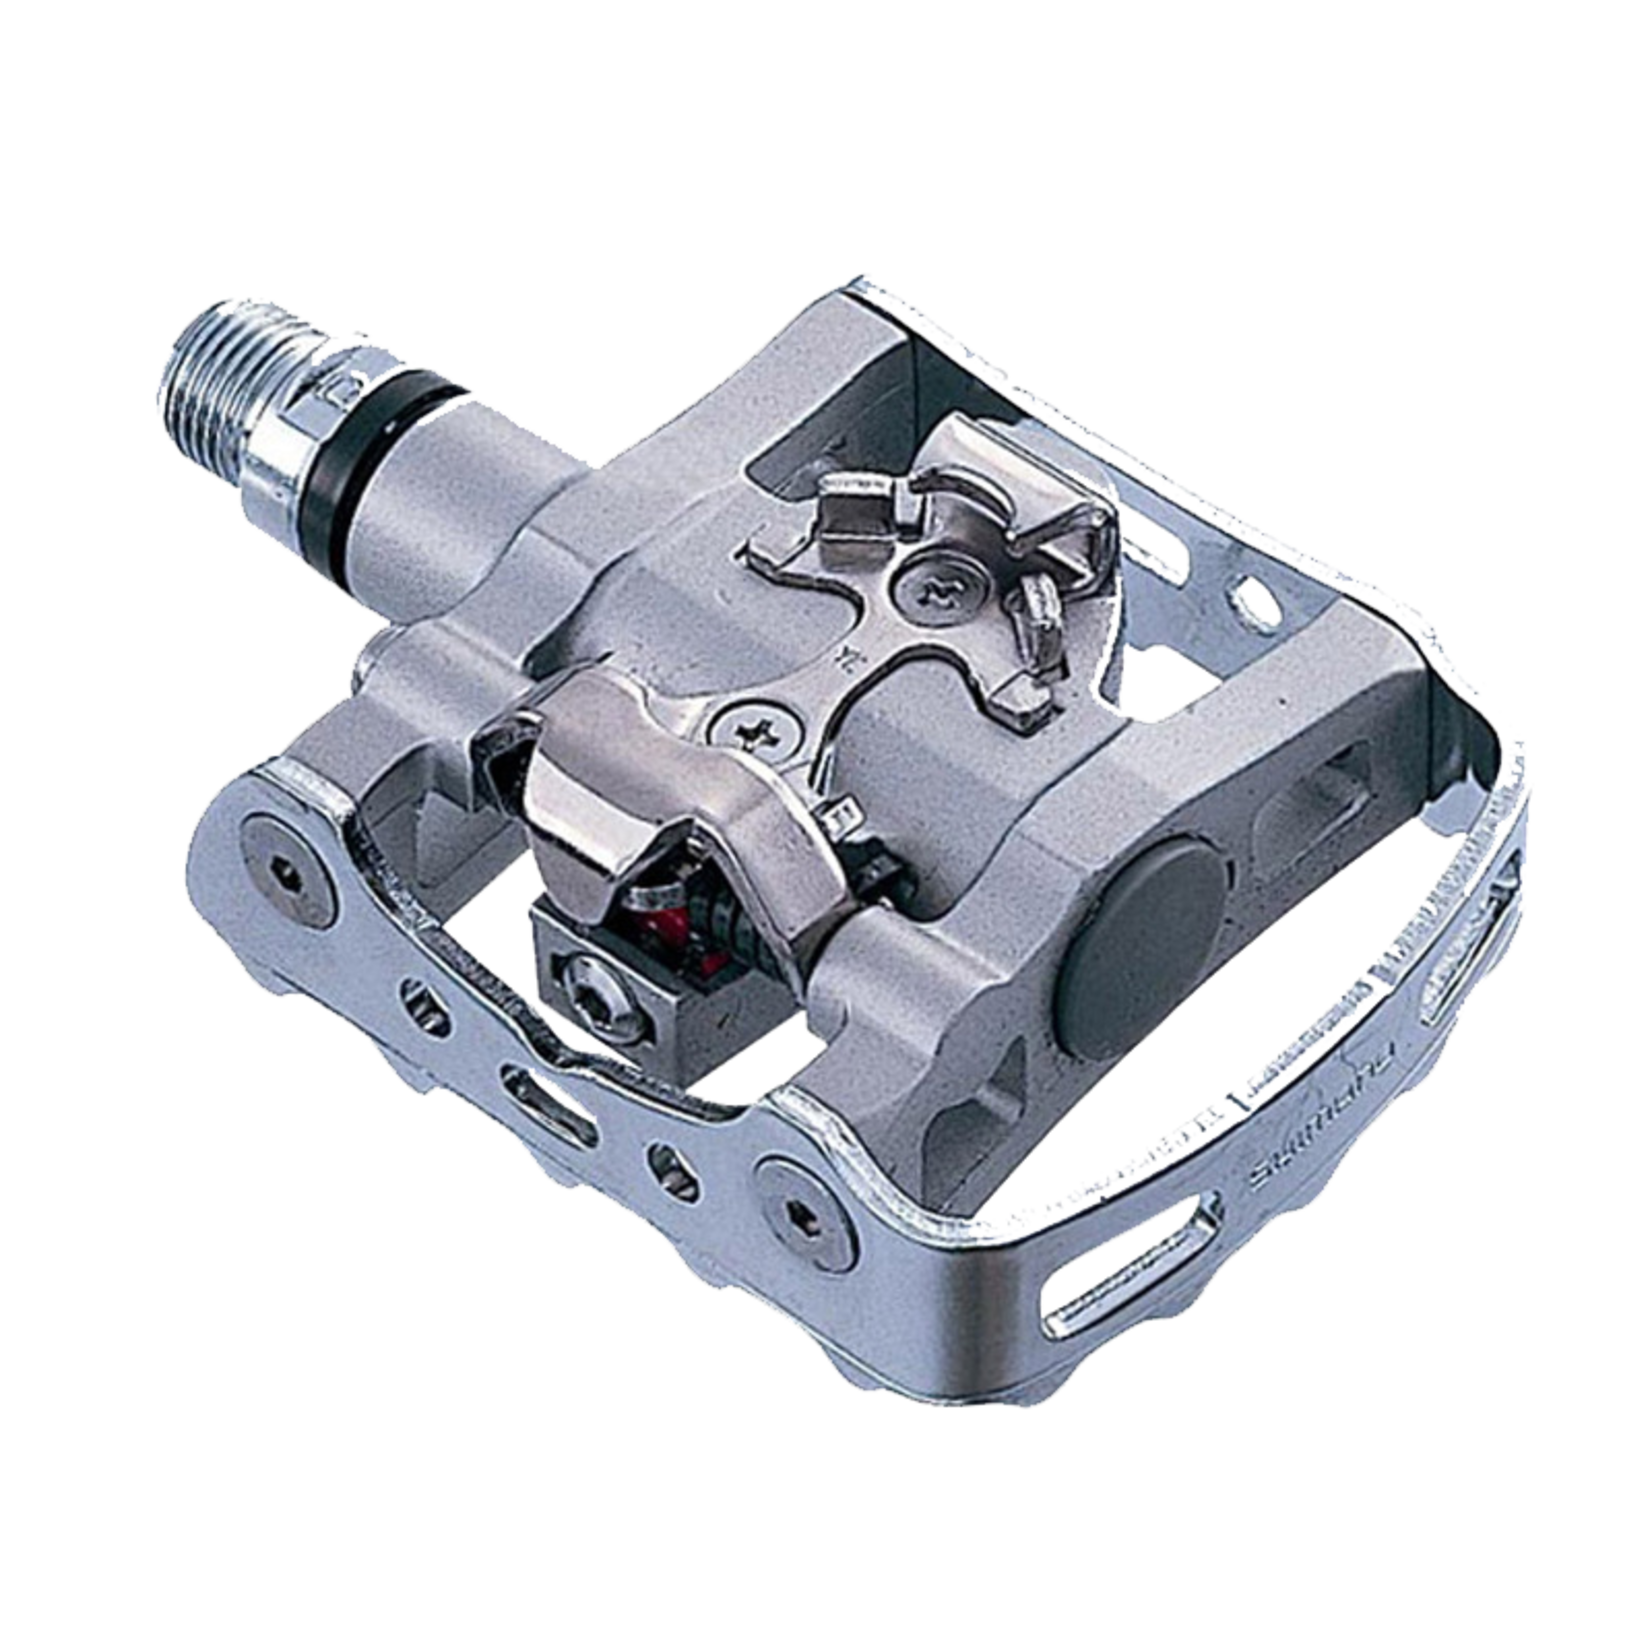 Shimano PEDAL  PD-M324 W/O REFLECTOR W/CLEAT(SM-SH56)